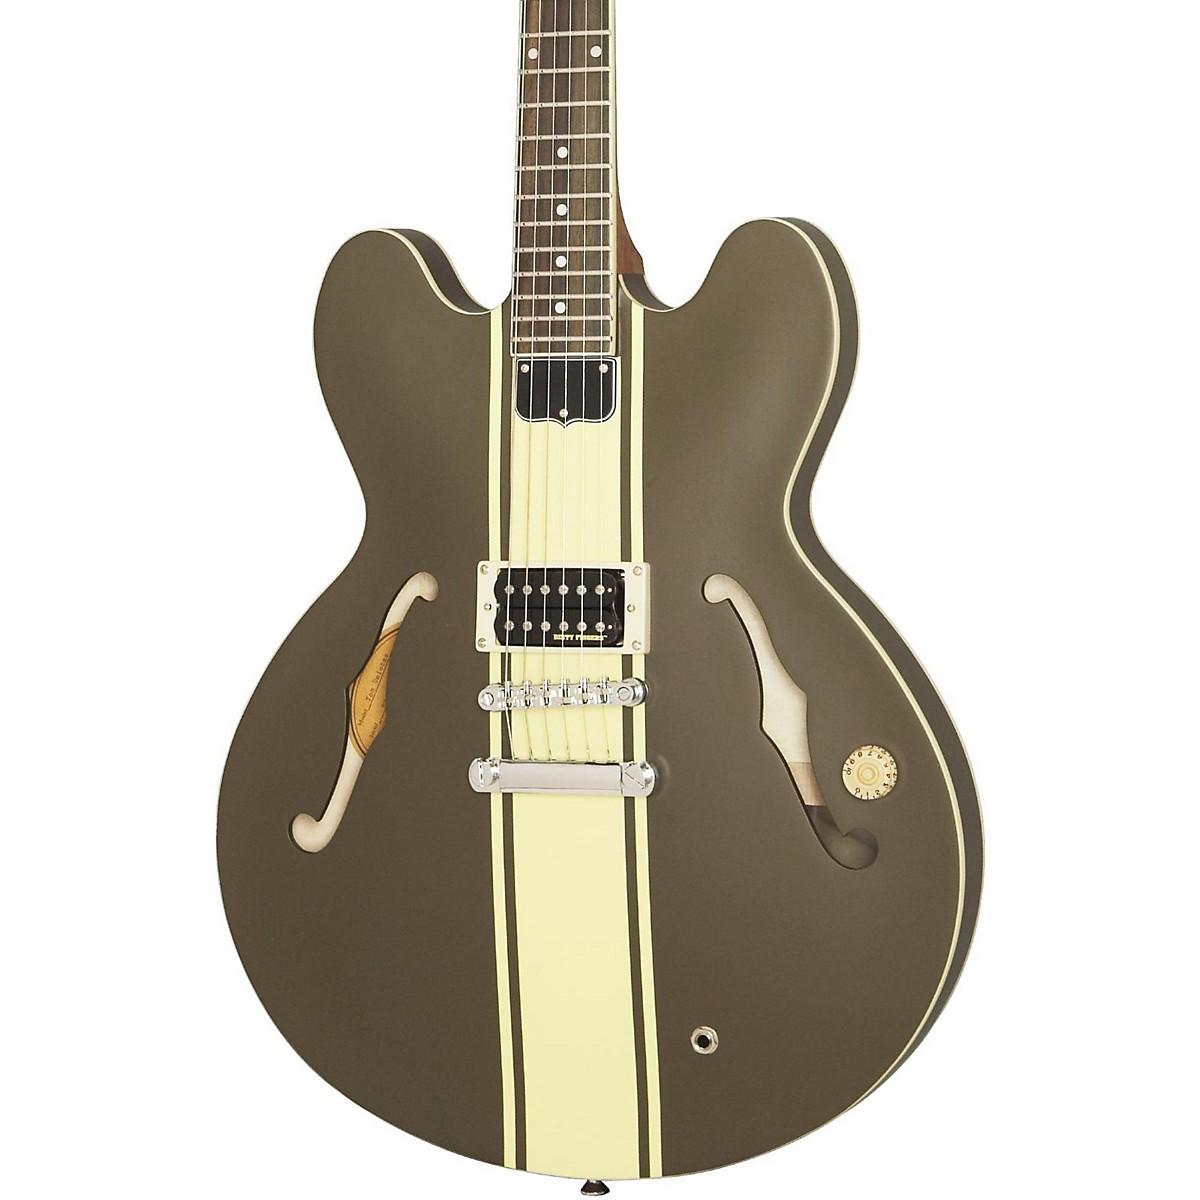 Epiphone Tom Delonge Signature ES-333 Semi-Hollow Electric Guitar